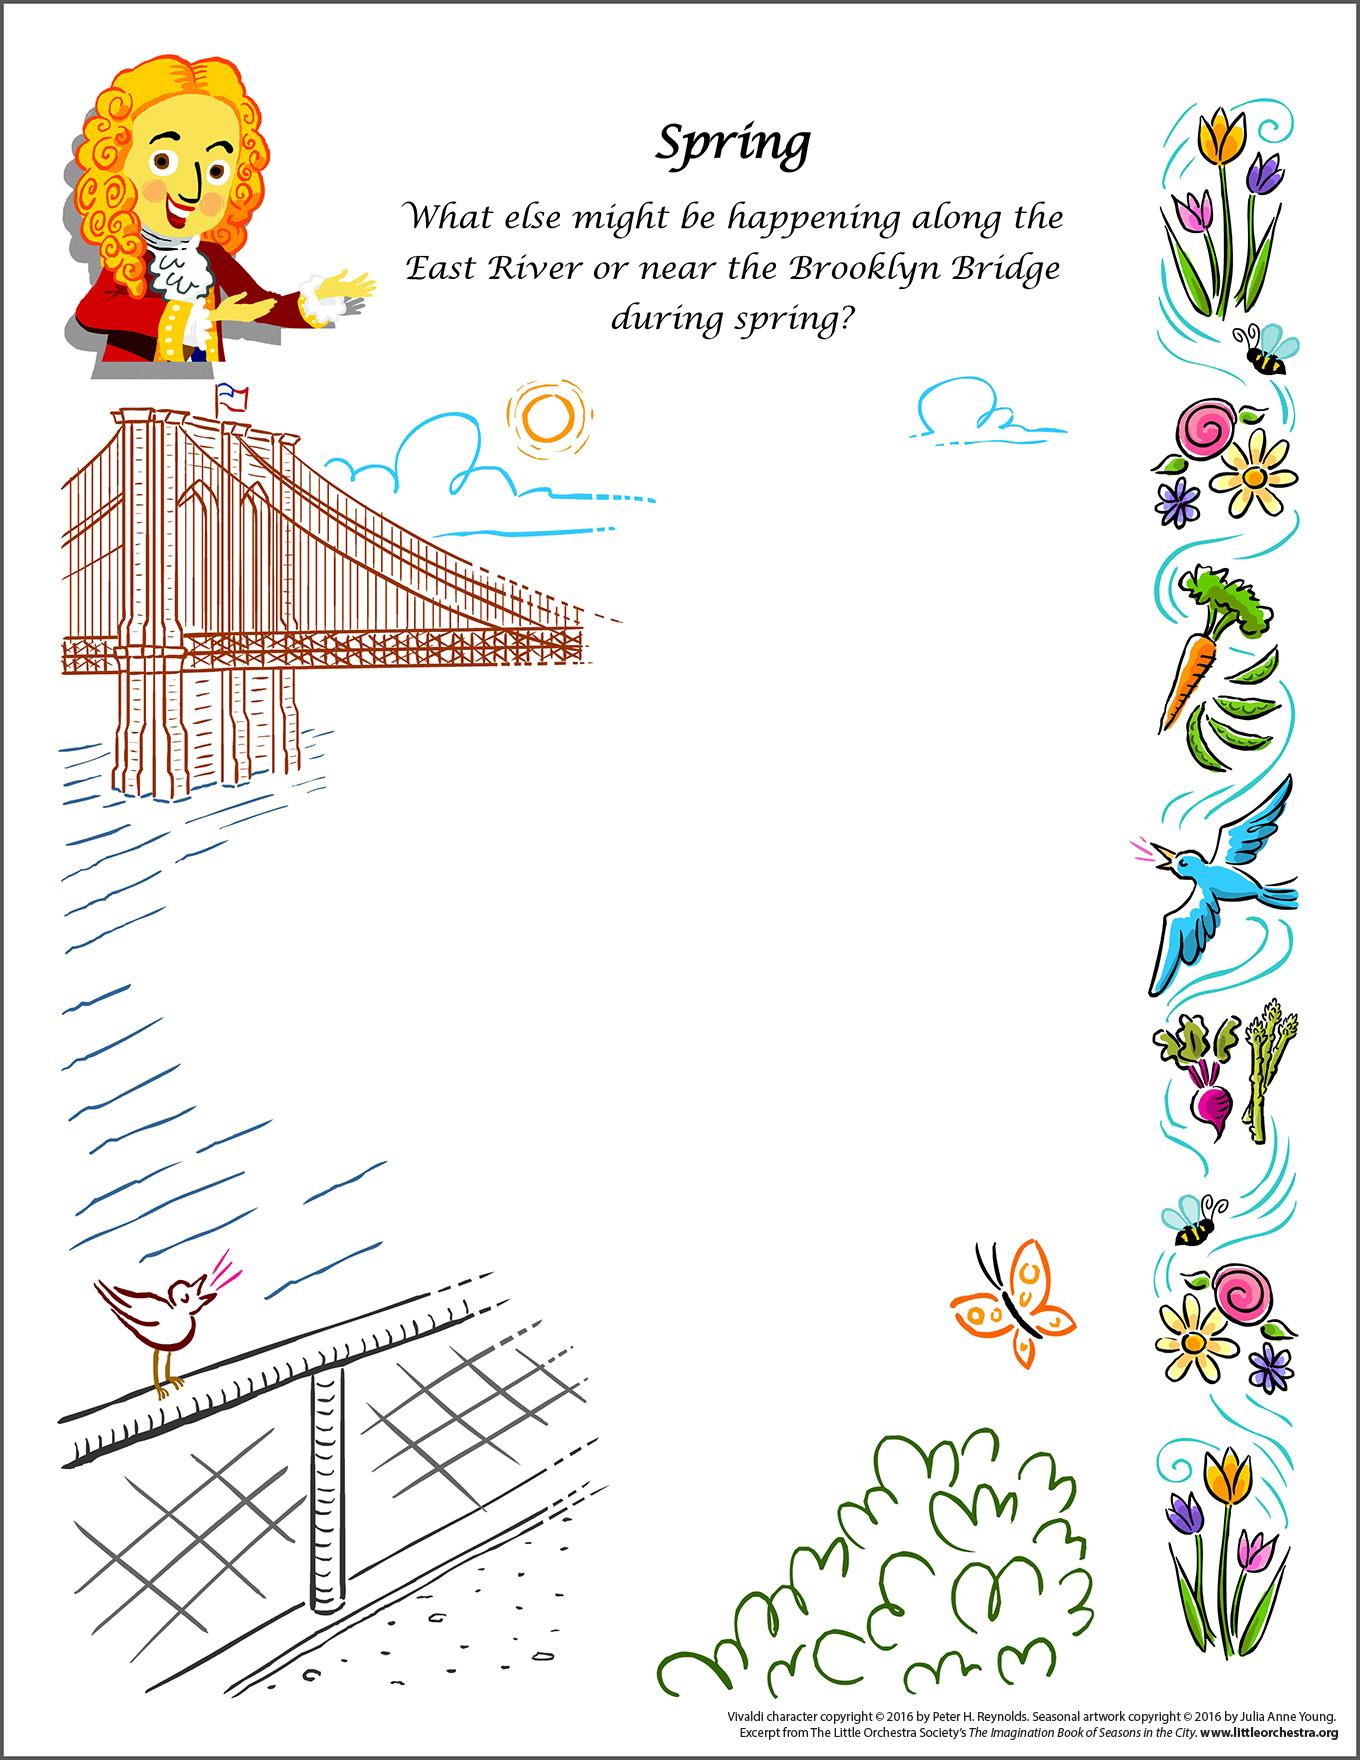 The Brooklyn Bridge in Spring